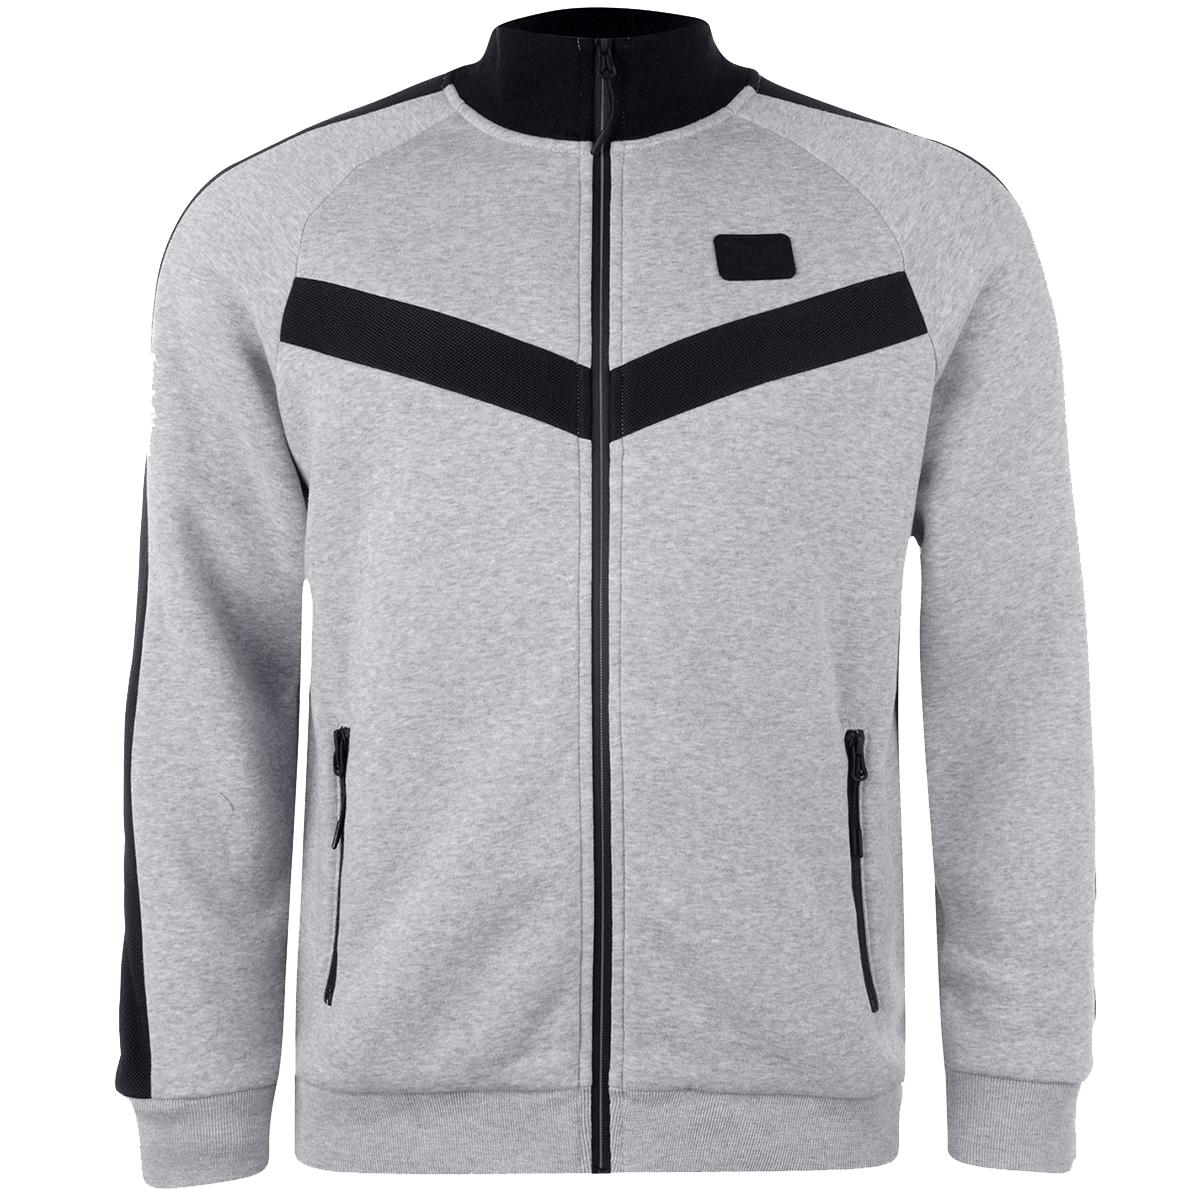 Everlast Men's Premium Zip Sweater - Black, S